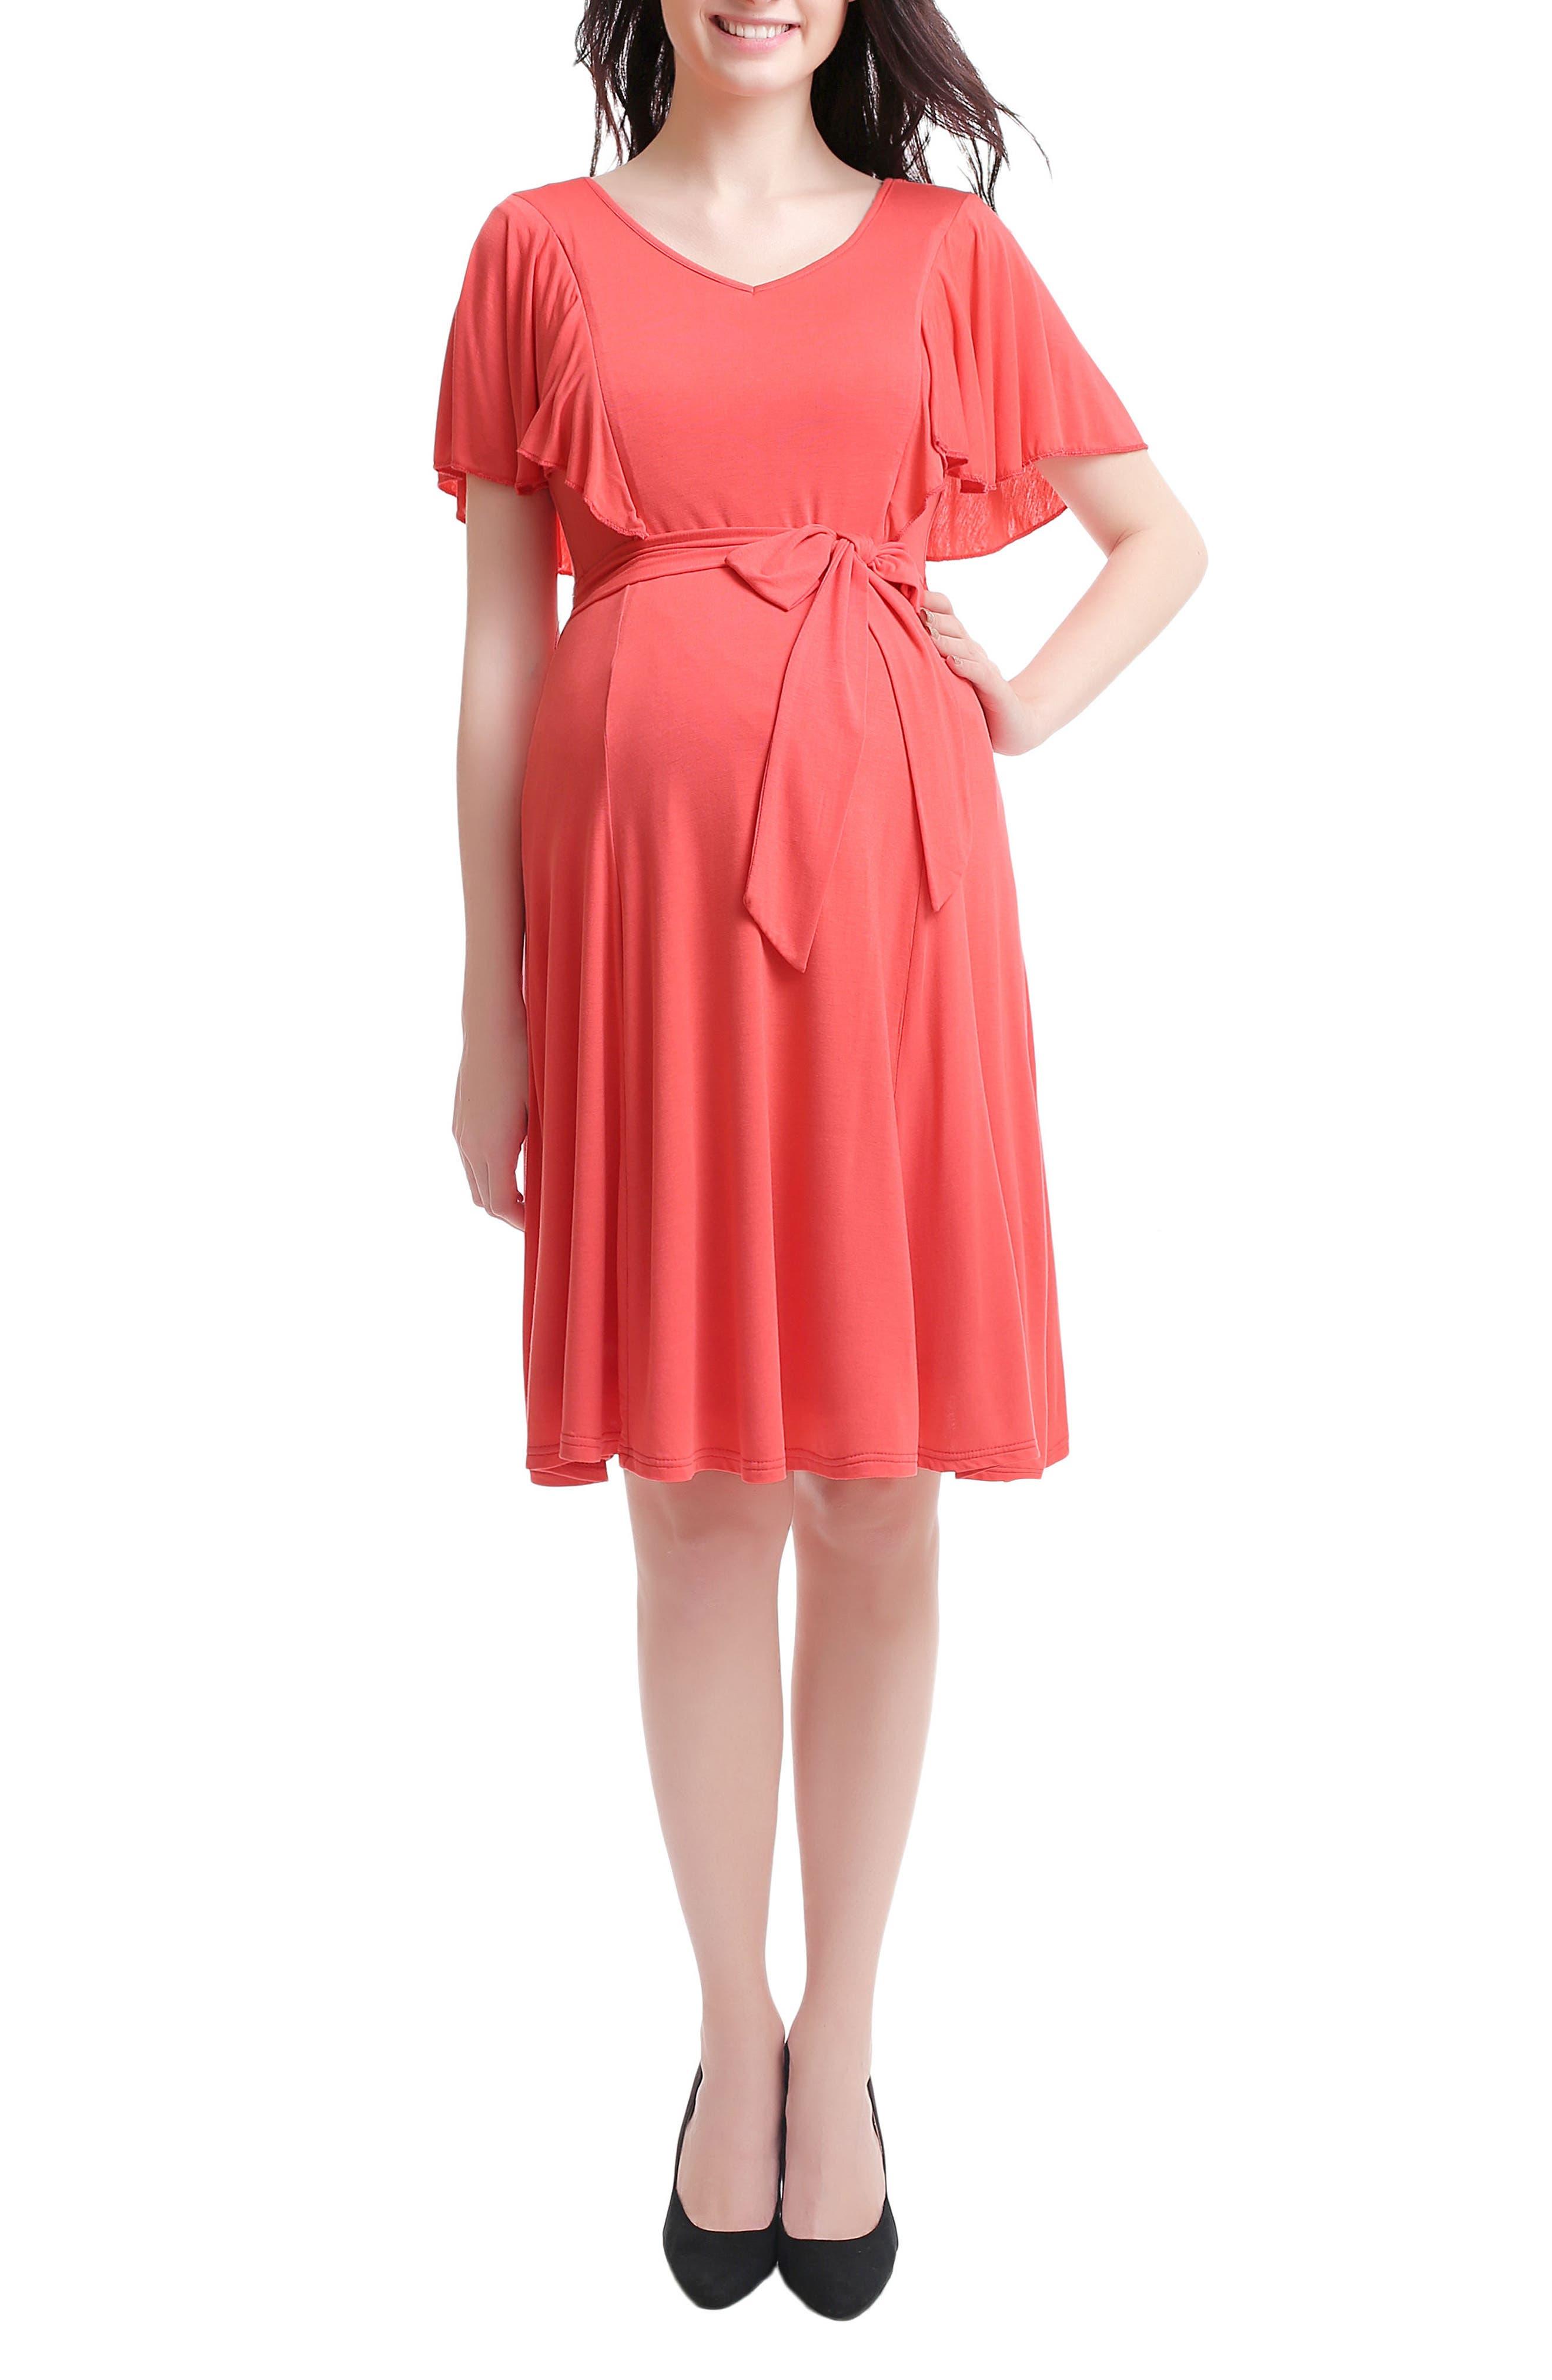 Main Image - Kimi & Kai Rhea Tie Maternity/Nursing Skater Dress